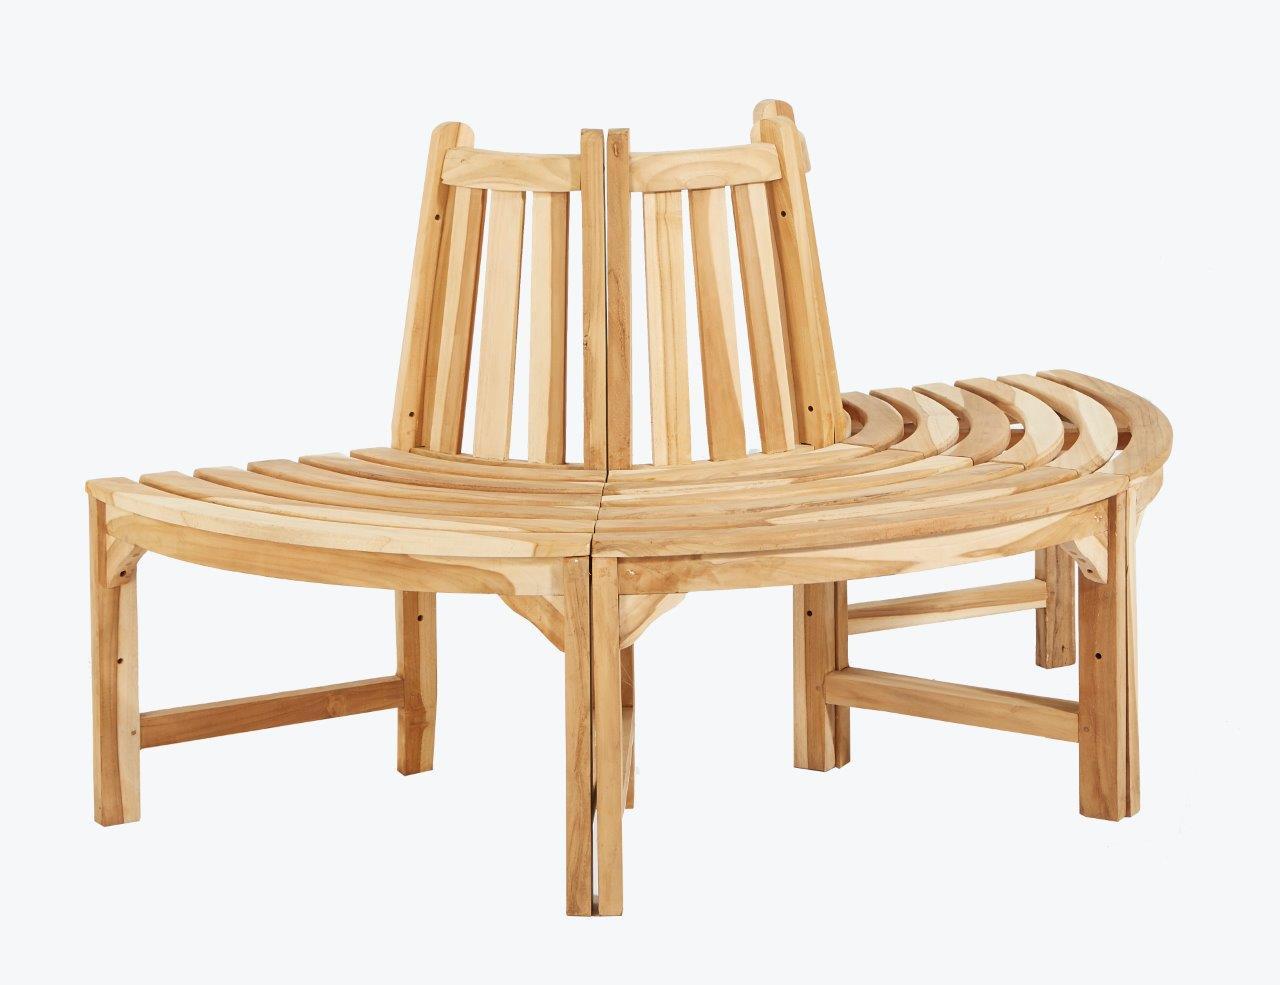 baumbank aus teakholz holzbank gartenbank 150 rundbank halber kreis teakbank ebay. Black Bedroom Furniture Sets. Home Design Ideas